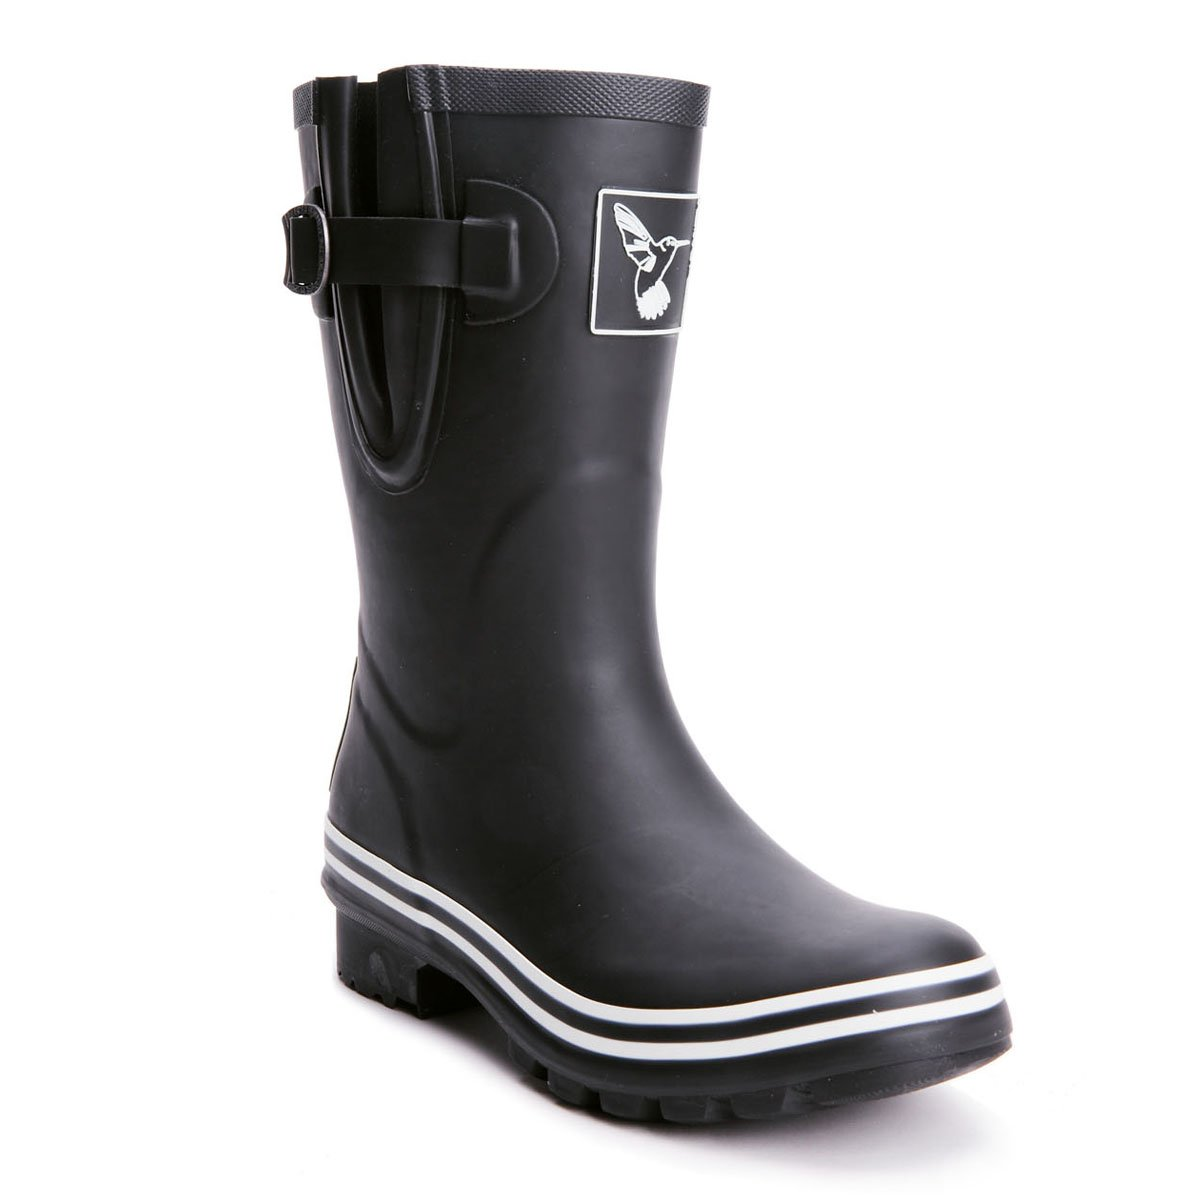 Evercreatures Women's Rain Boot Printing Waterproof Mid-Calf Boots Cute Printing Boot Rainbow Rain Boots Wellies Rain Shoes UK Brand B011LP0JZI 5 B(M) US / UK3 / EU36|Black 5f8af1